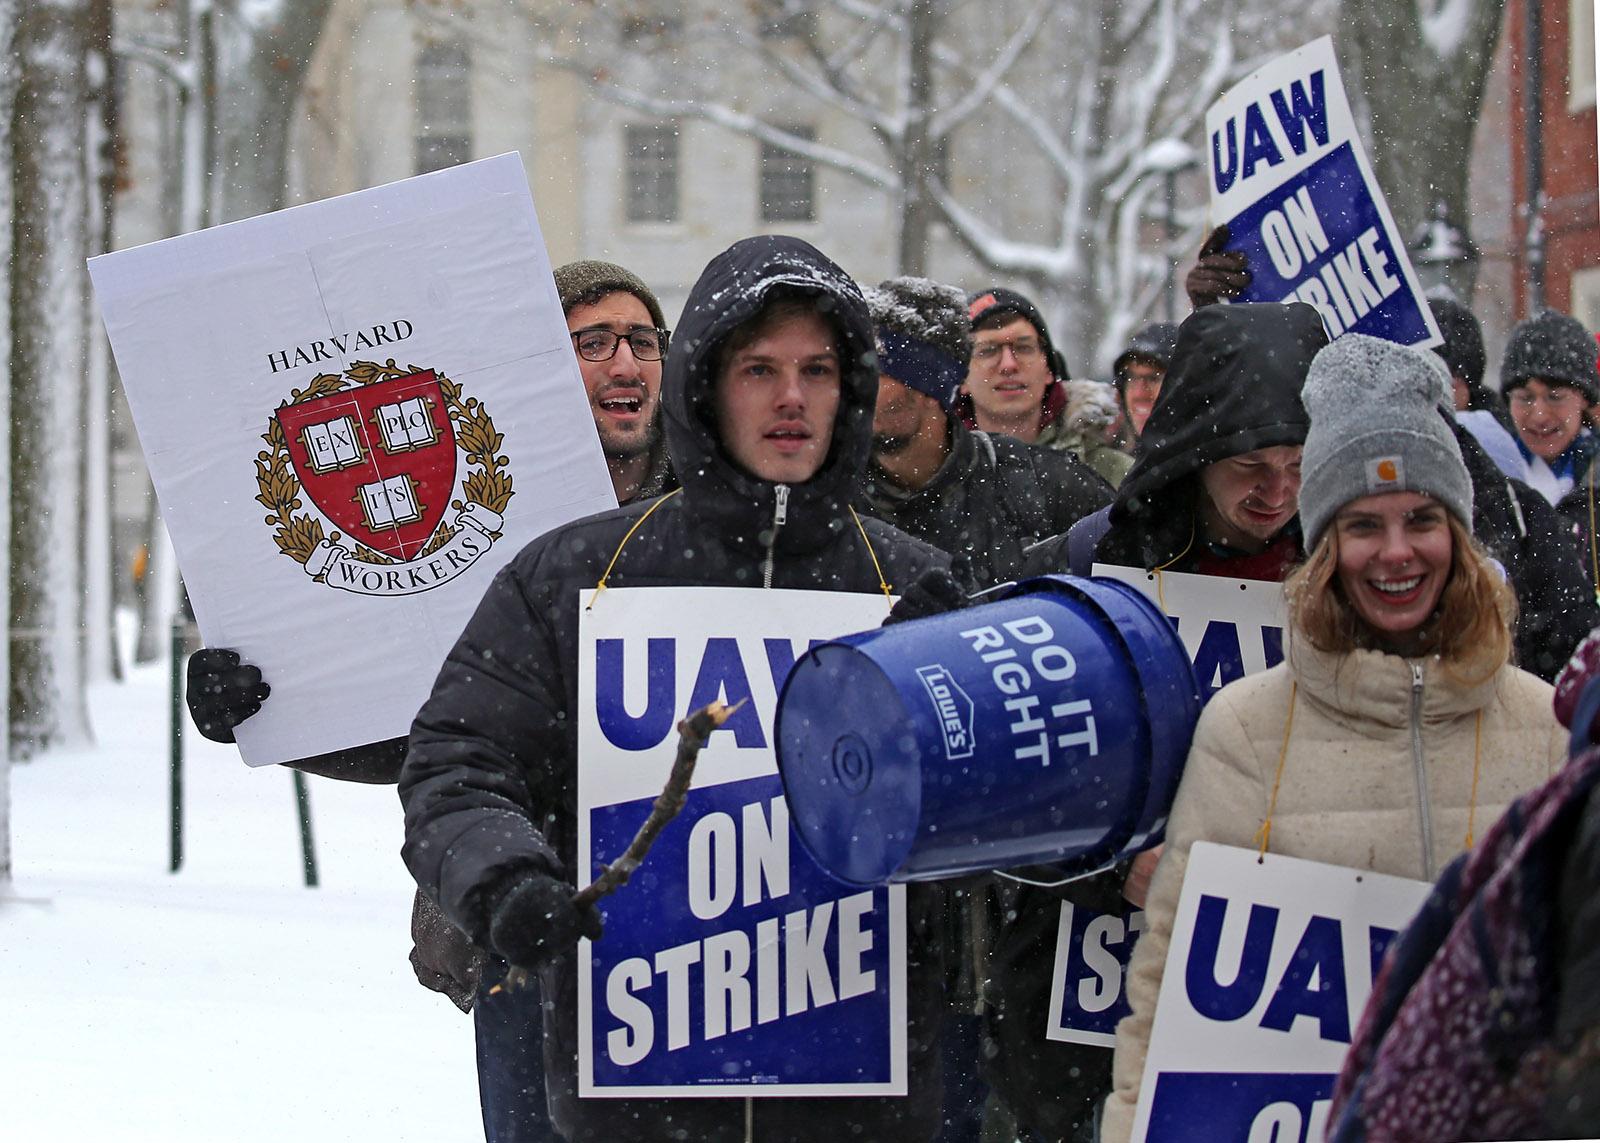 Striking Harvard graduate students marching